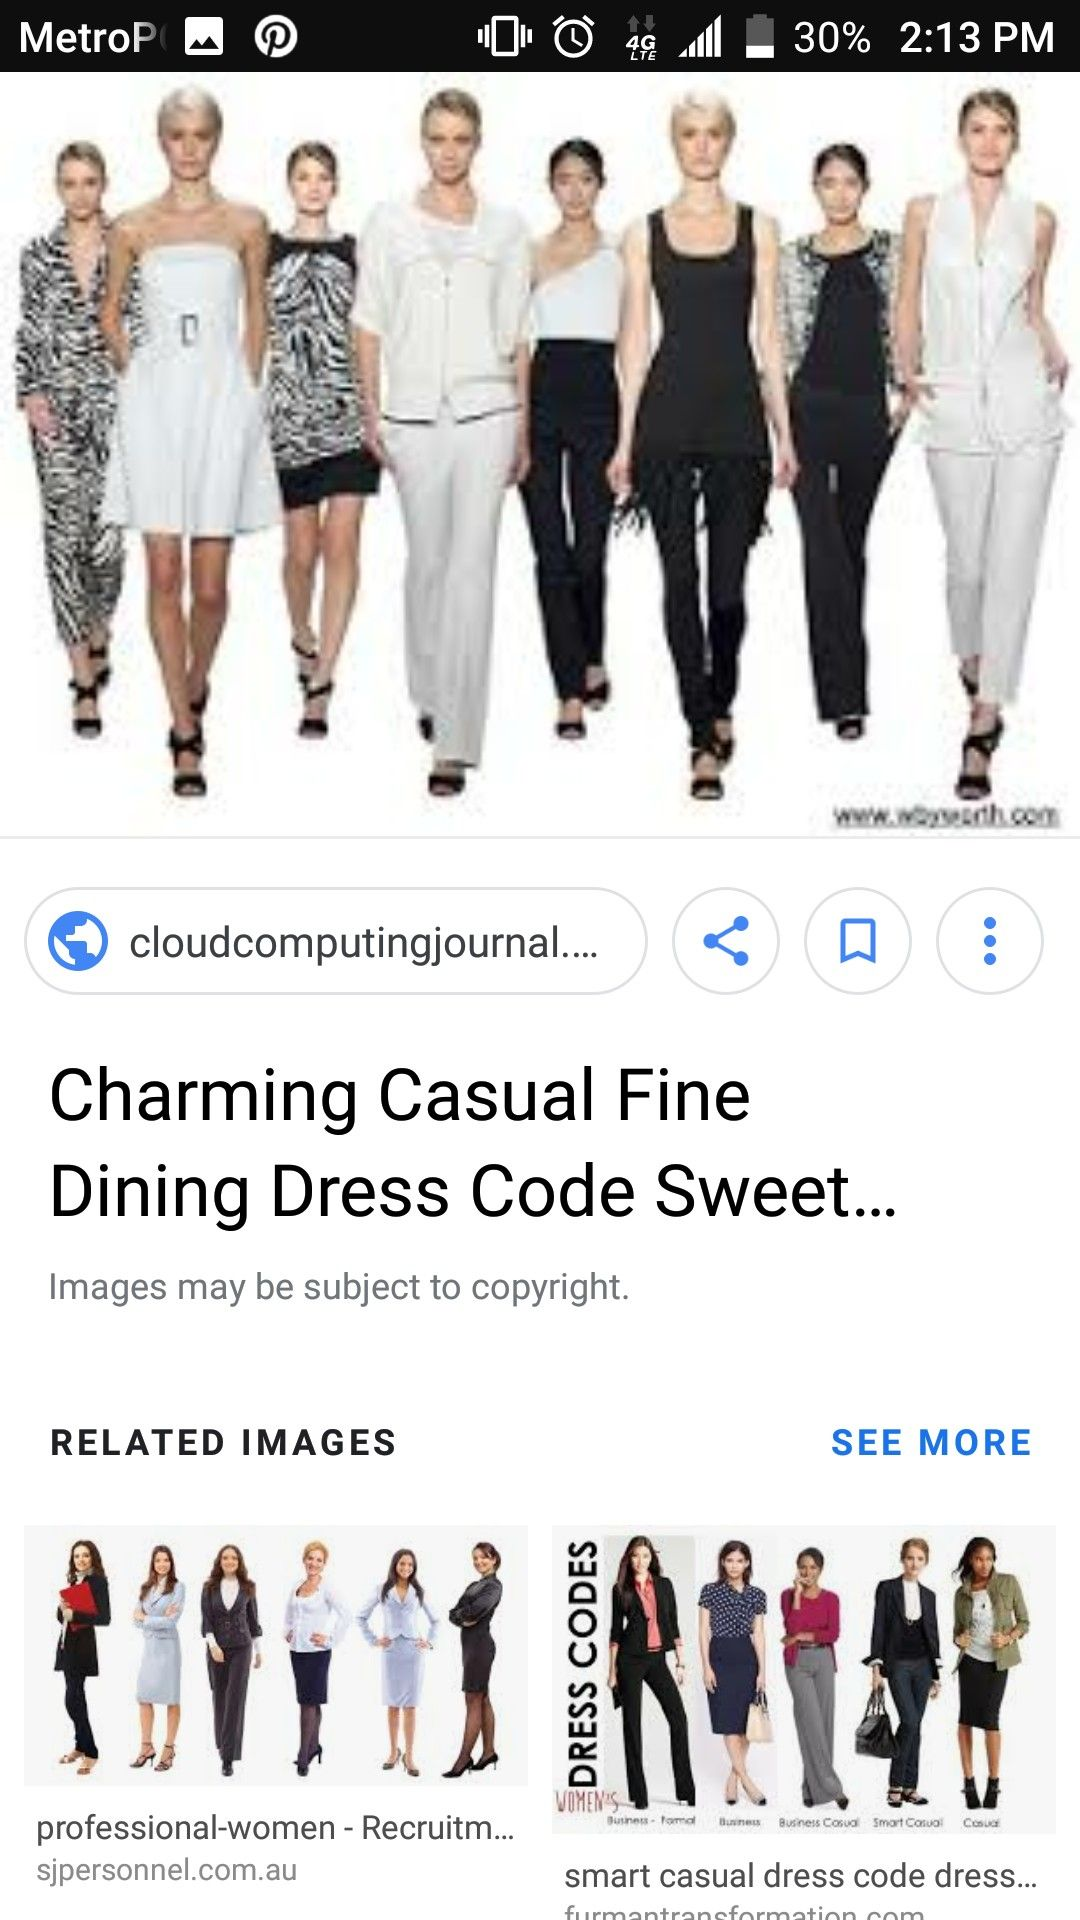 نفسه مستشفى الهضم fine dining dress code for ladies